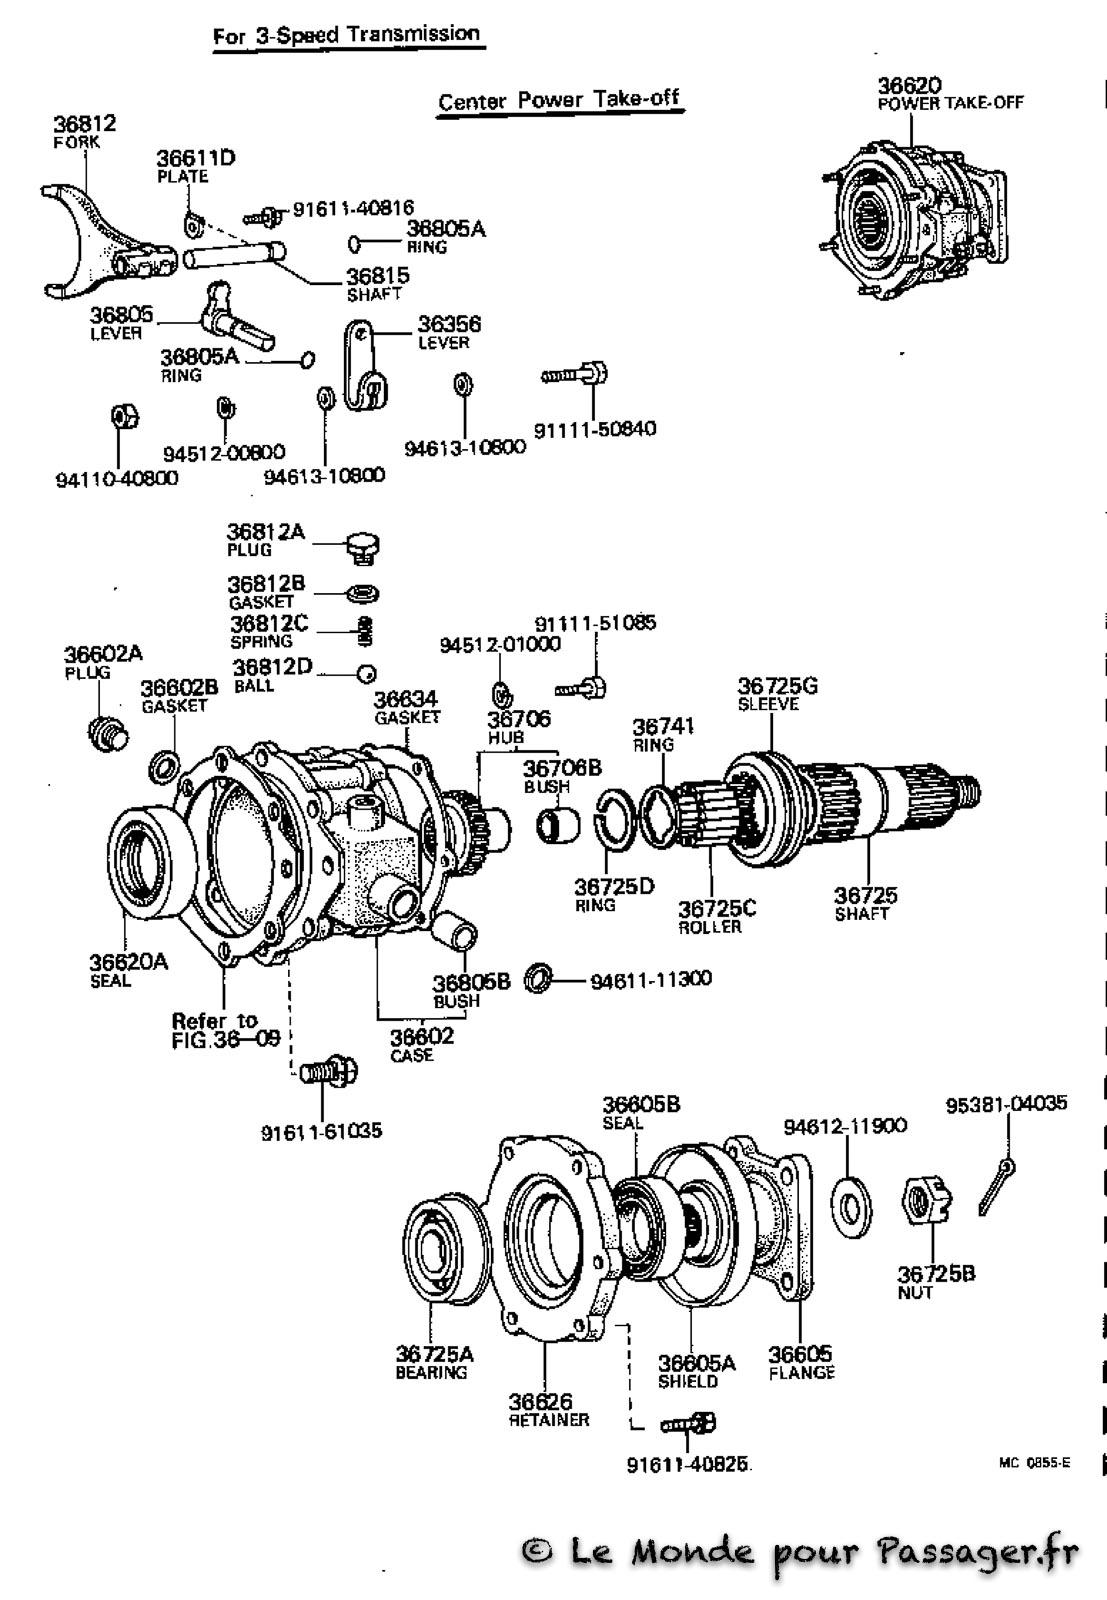 Fj55-Eclatés-Techniques125